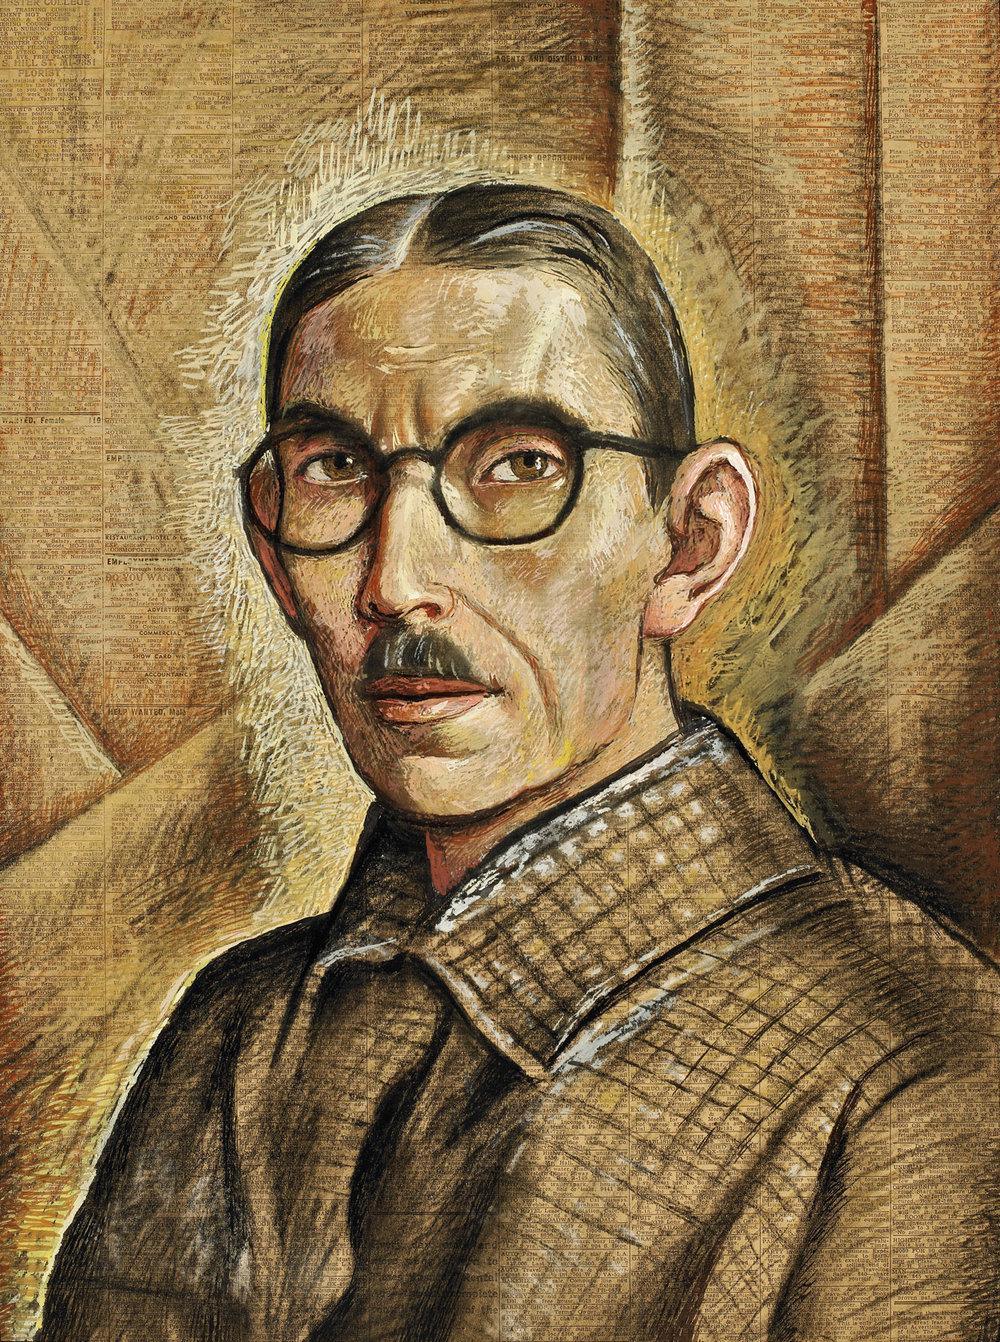 Alfredo Ramos Martinez  (1871-1946)  Autoretrato/ Self Portrait , ca. 1938 tempera on newsprint 20.8 x 15.3 inches 53 x 39 centimeters